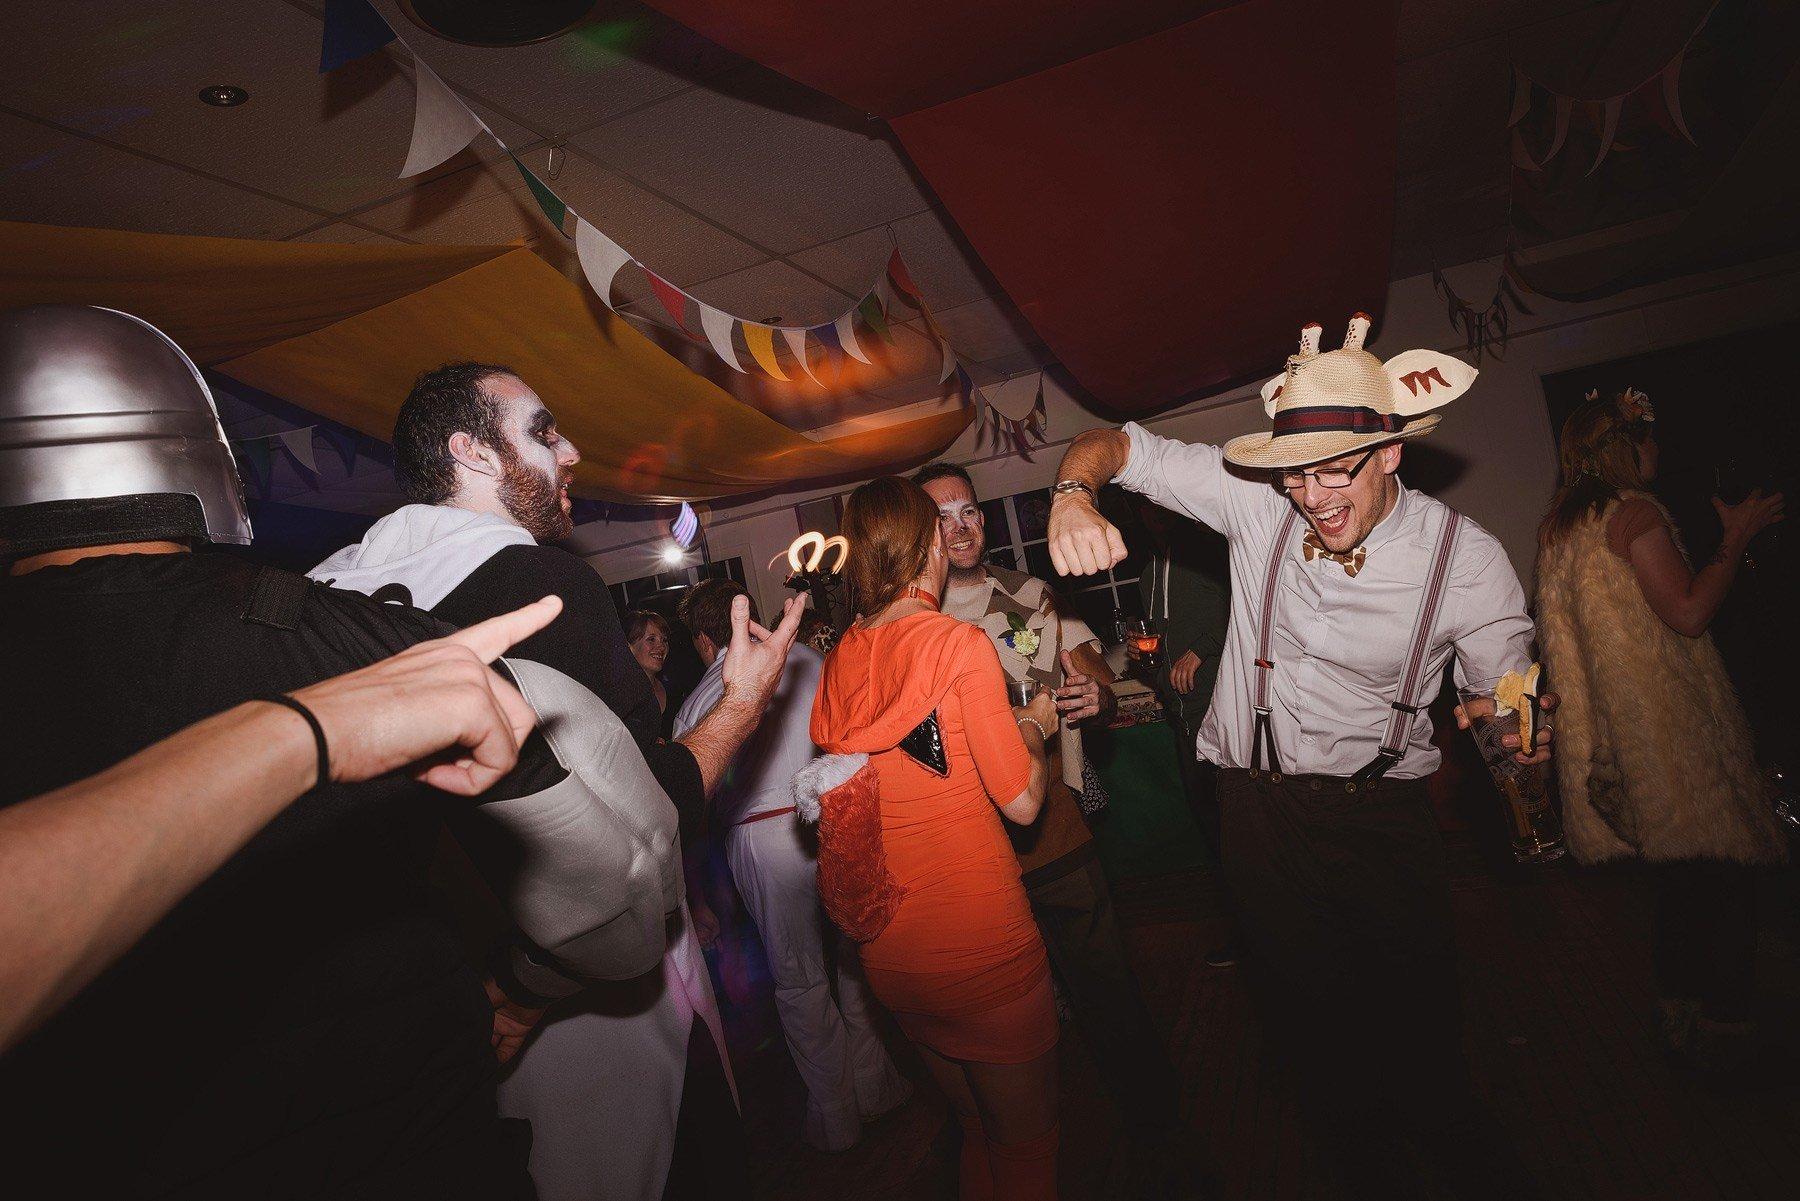 dancing at a fancy dress wedding